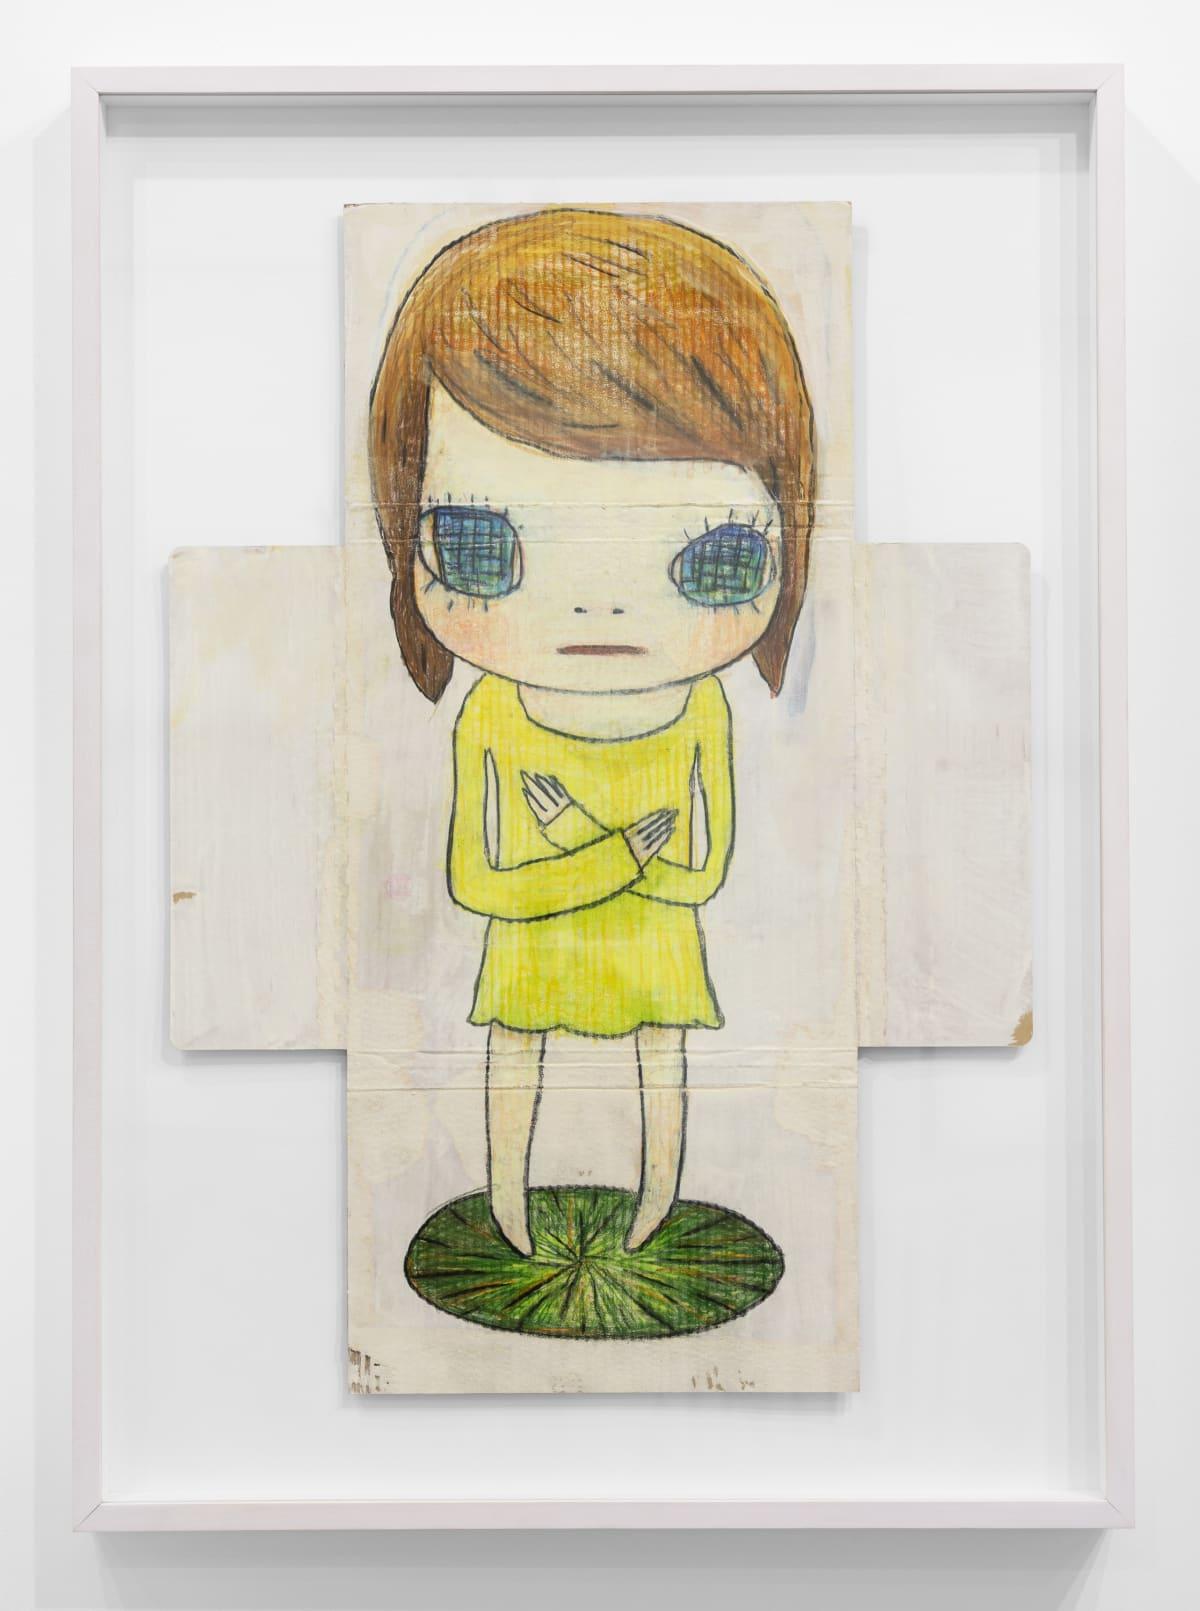 Yoshitomo Nara Untitled, 2011 Acrylic and color pencil on cardboard 30 1/8 x 21 7/8 in (76.5 x 55.5 cm) © YOSHITOMO NARA